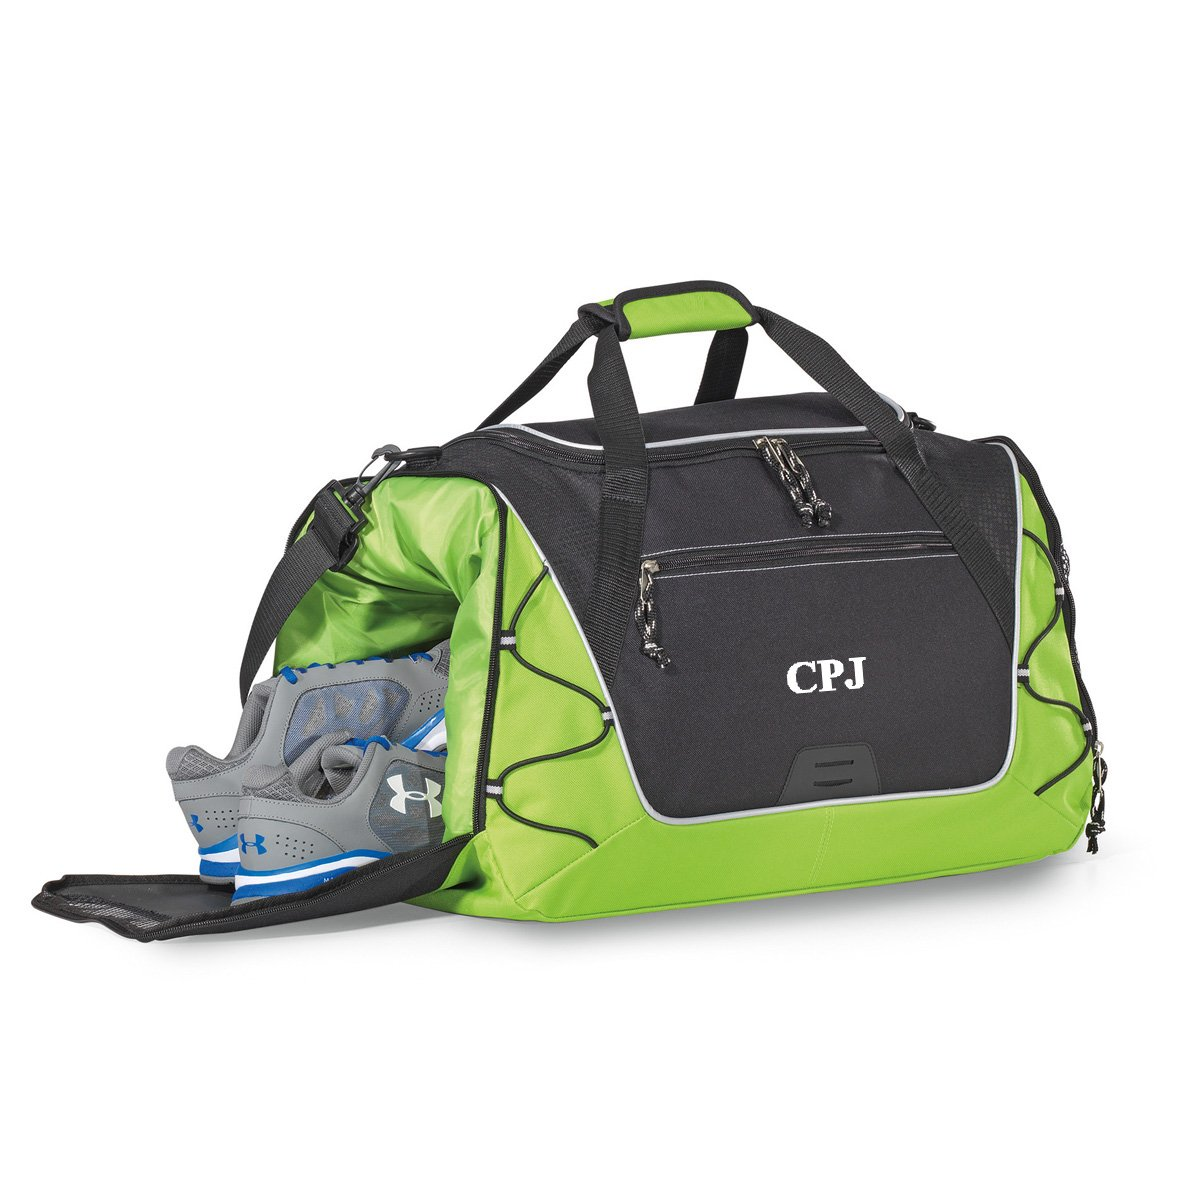 36c7b0d09d Amazon.com  Personalized Green Sports Duffel Bag – Gym Bag